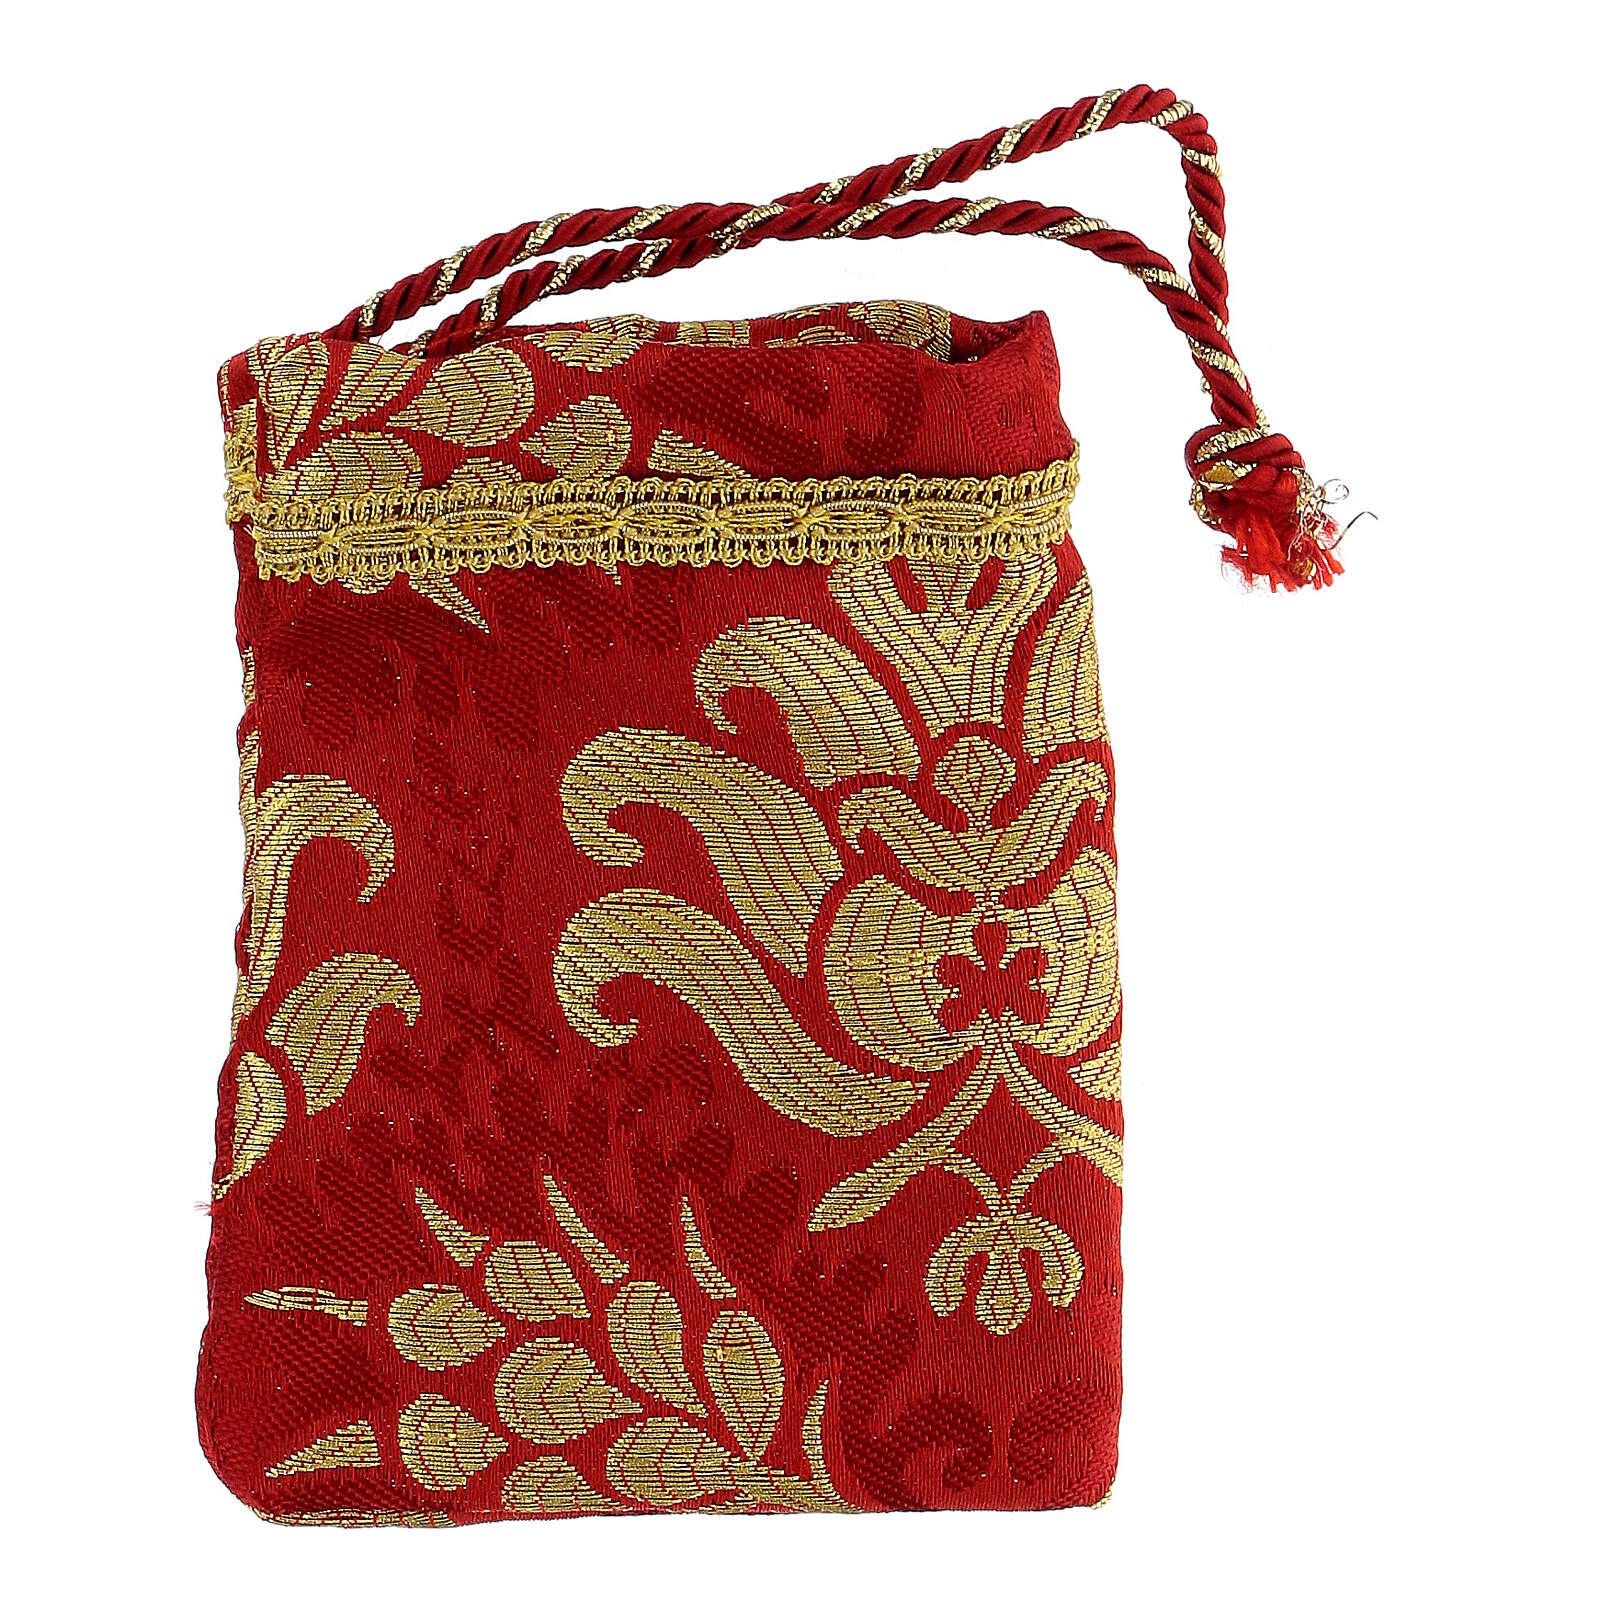 Bolsa para viático rojo de tejido brocado relicario 5 cm 3